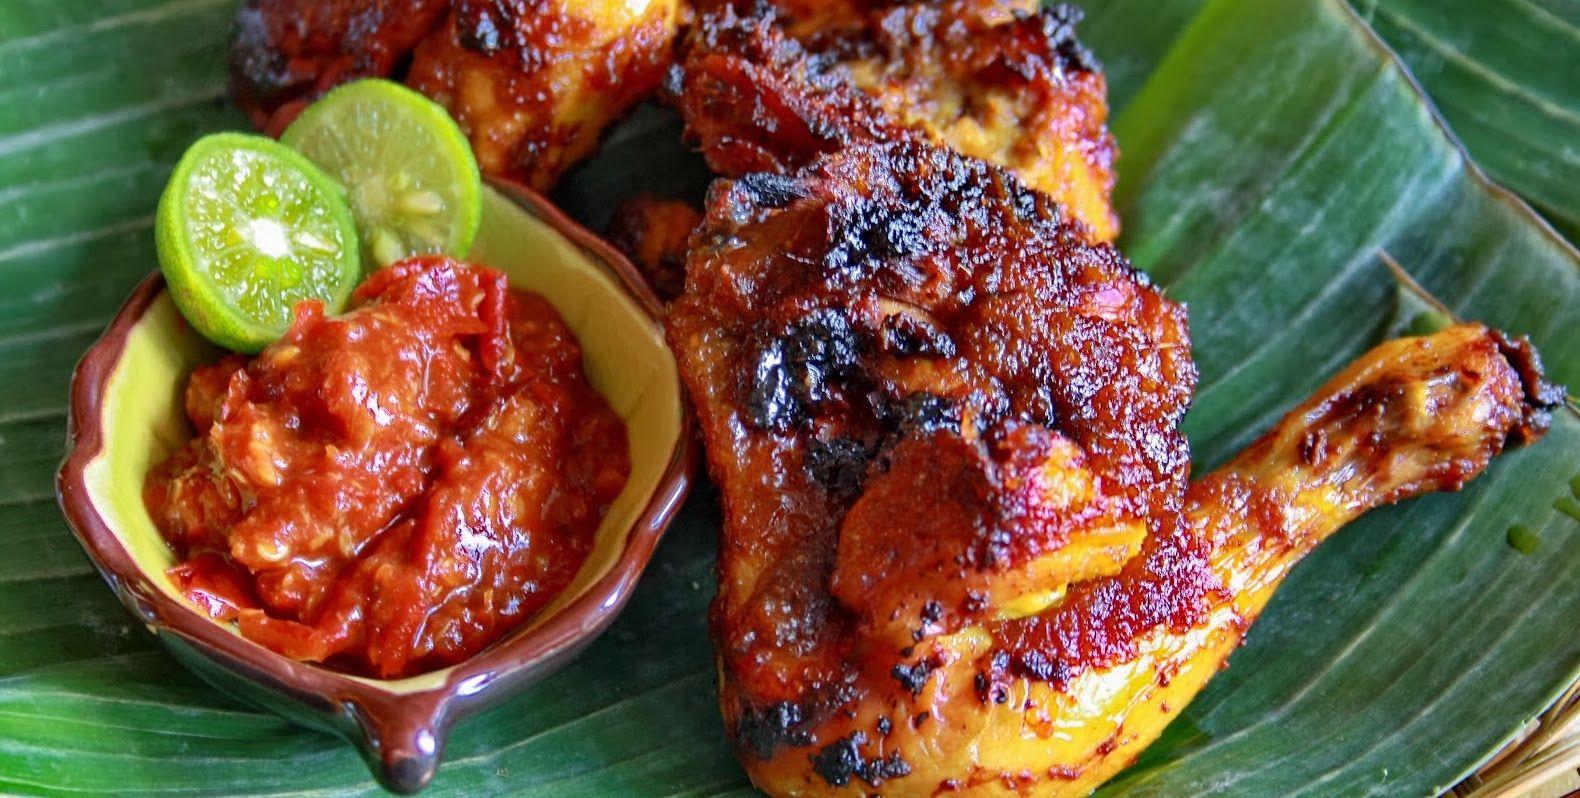 Resep Ayam Bakar Kecap Spesial Untuk Malam Tahun Baru Resep Ayam Resep Masakan Pedas Resep Masakan